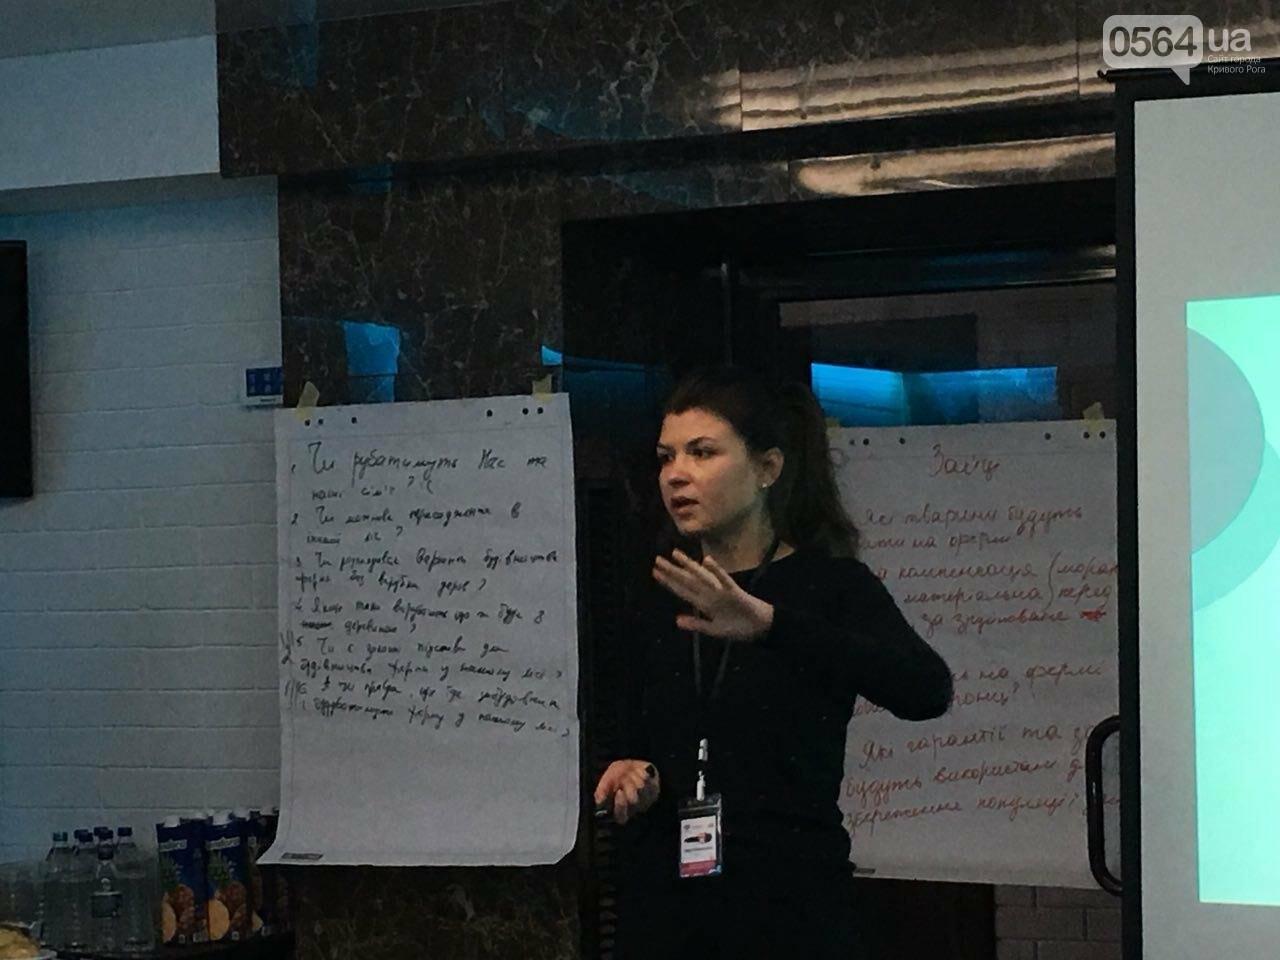 На тренинге о ВИЧ и медреформе криворожским журналистам рассказали о дискриминации и стереотипах, - ФОТО , фото-23